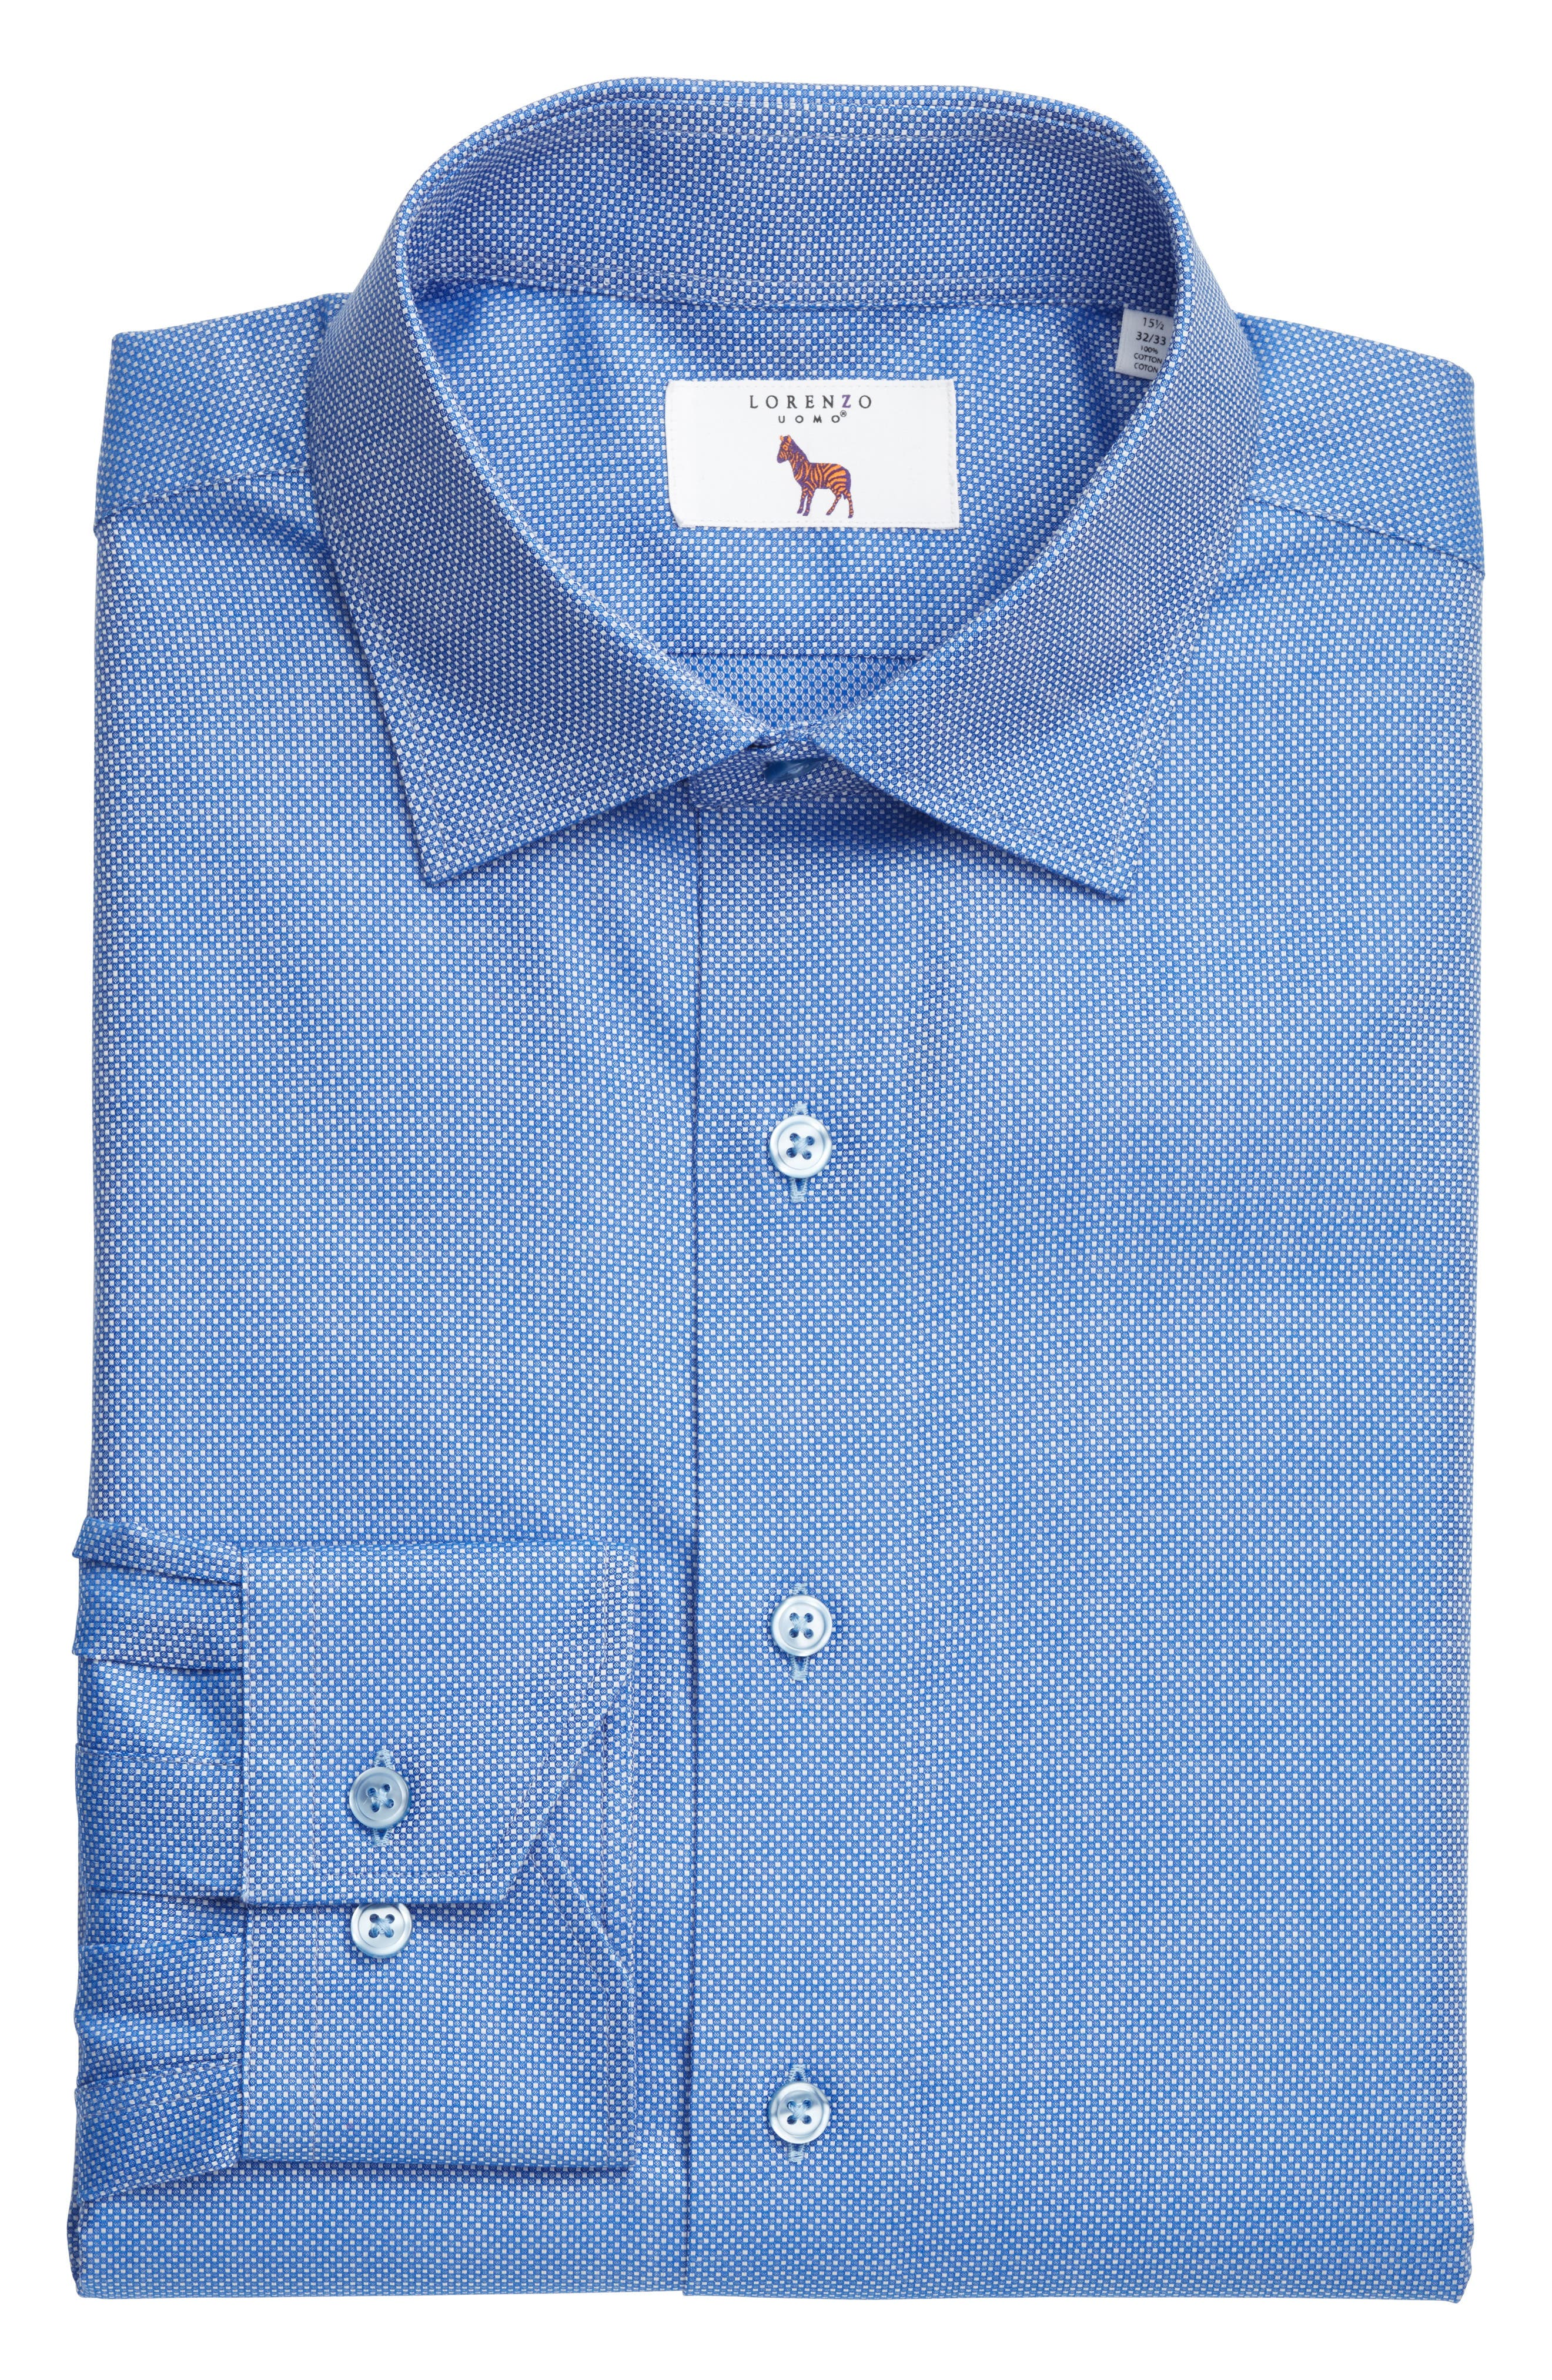 Alternate Image 1 Selected - Lorenzo Uomo Trim Fit Textured Dress Shirt